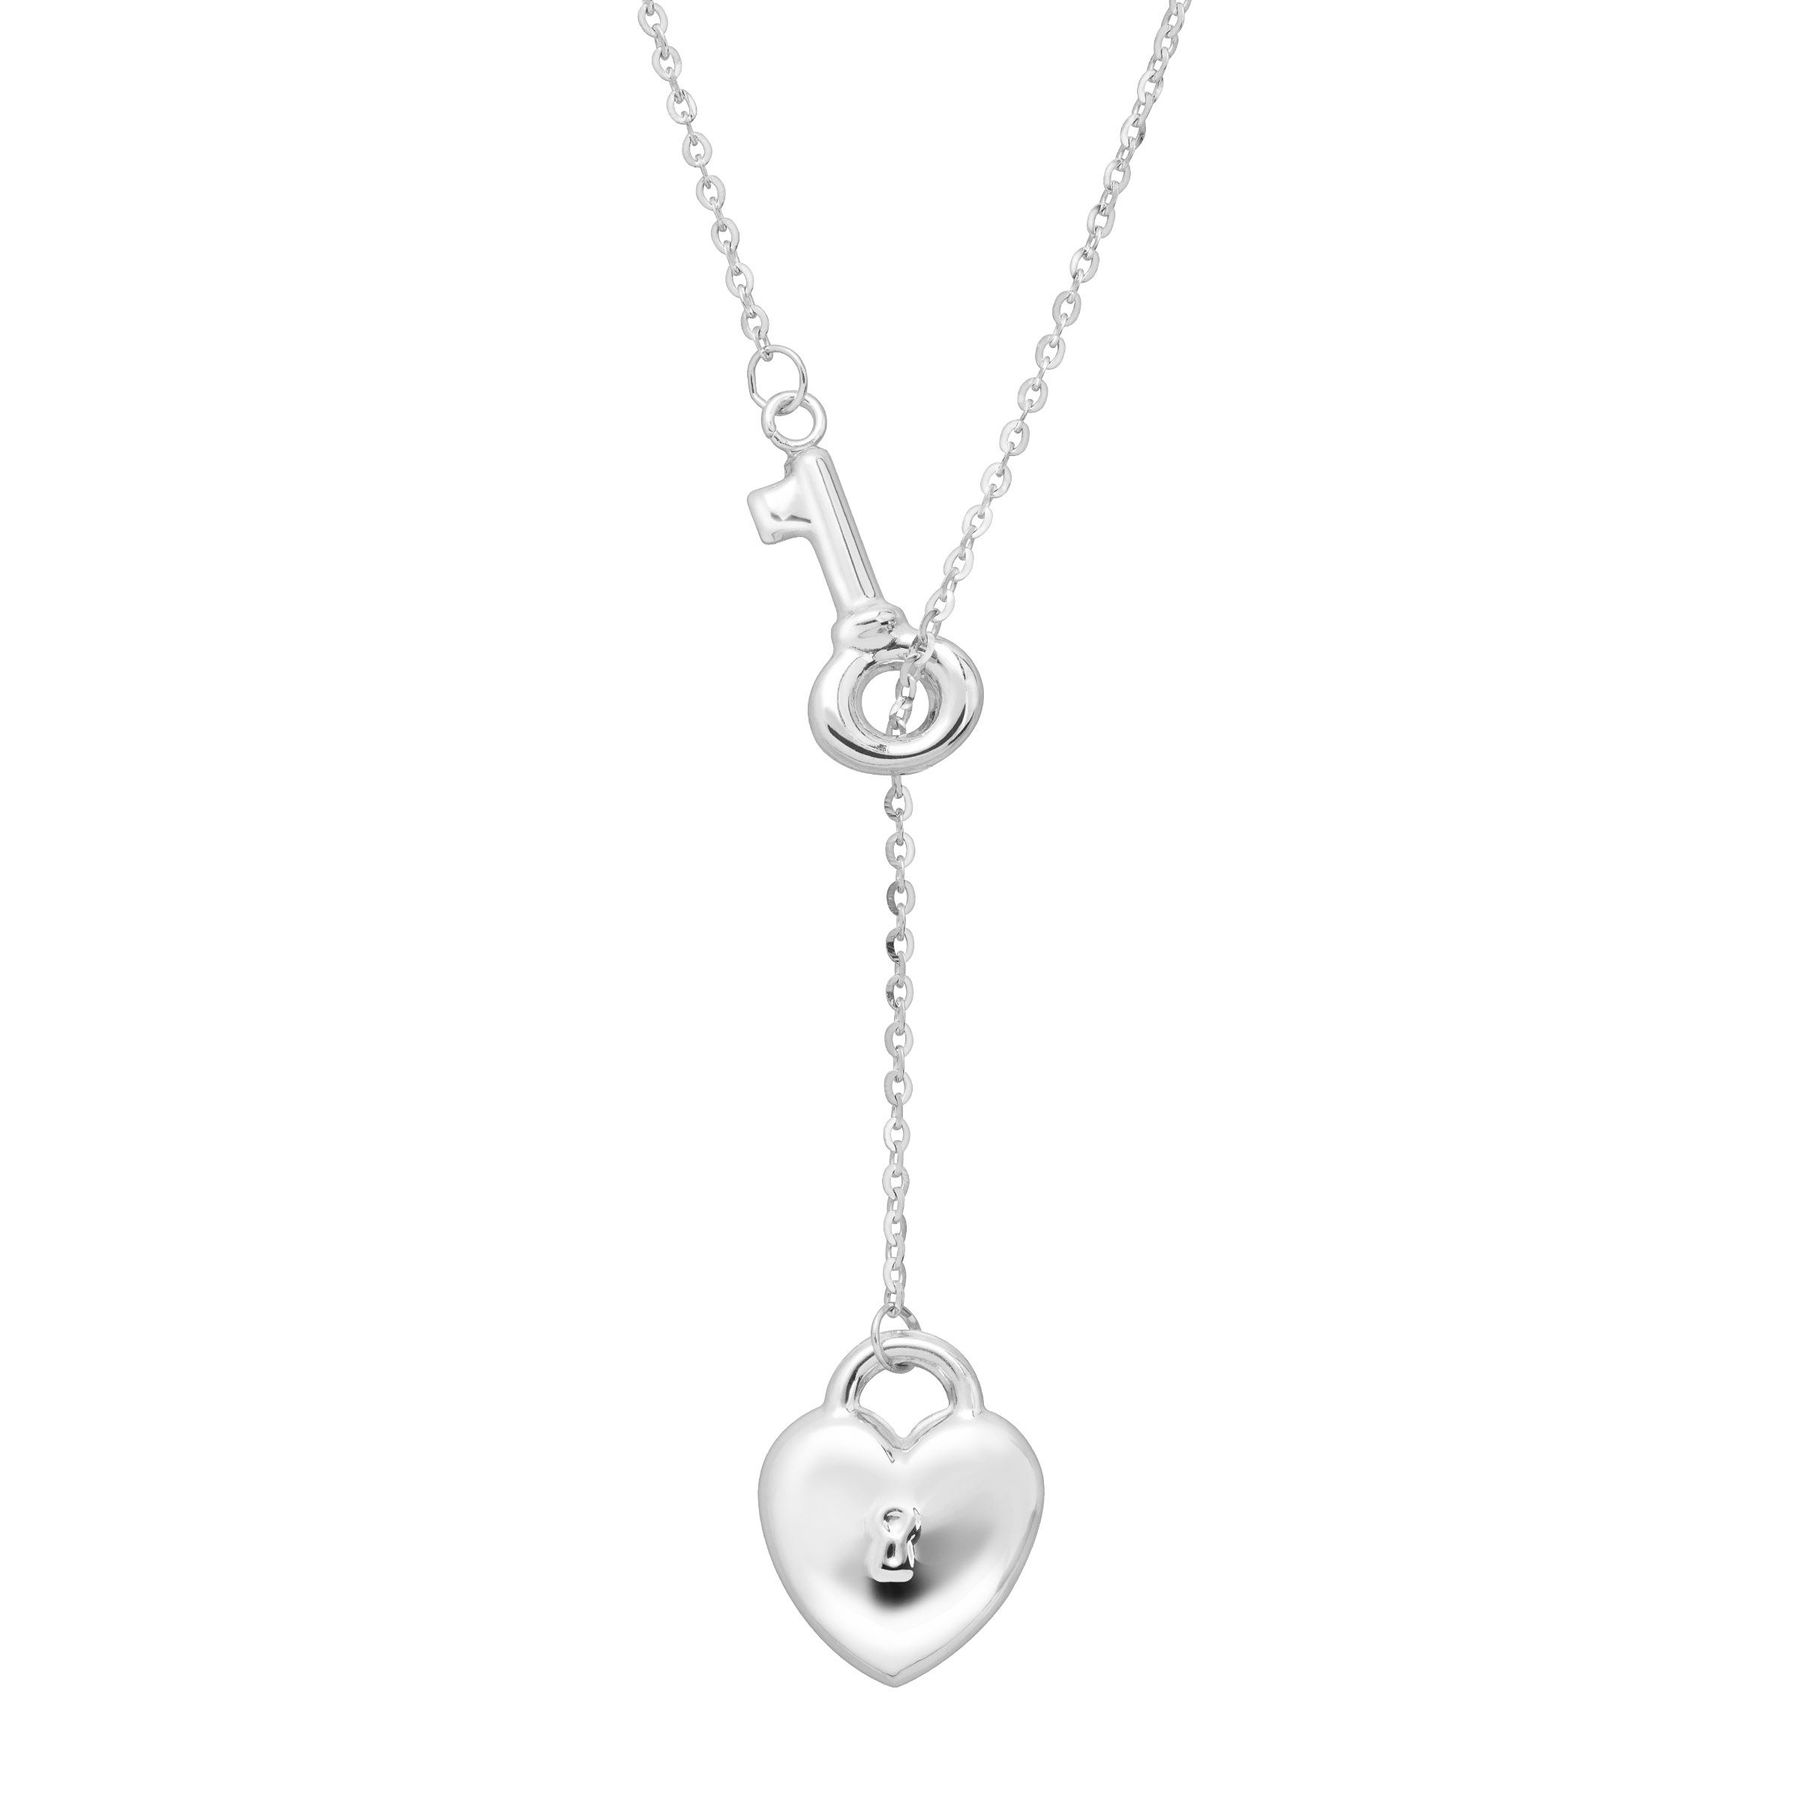 Eternity gold heart lock key lariat necklace in 14k white gold heart lock key lariat necklace aloadofball Gallery